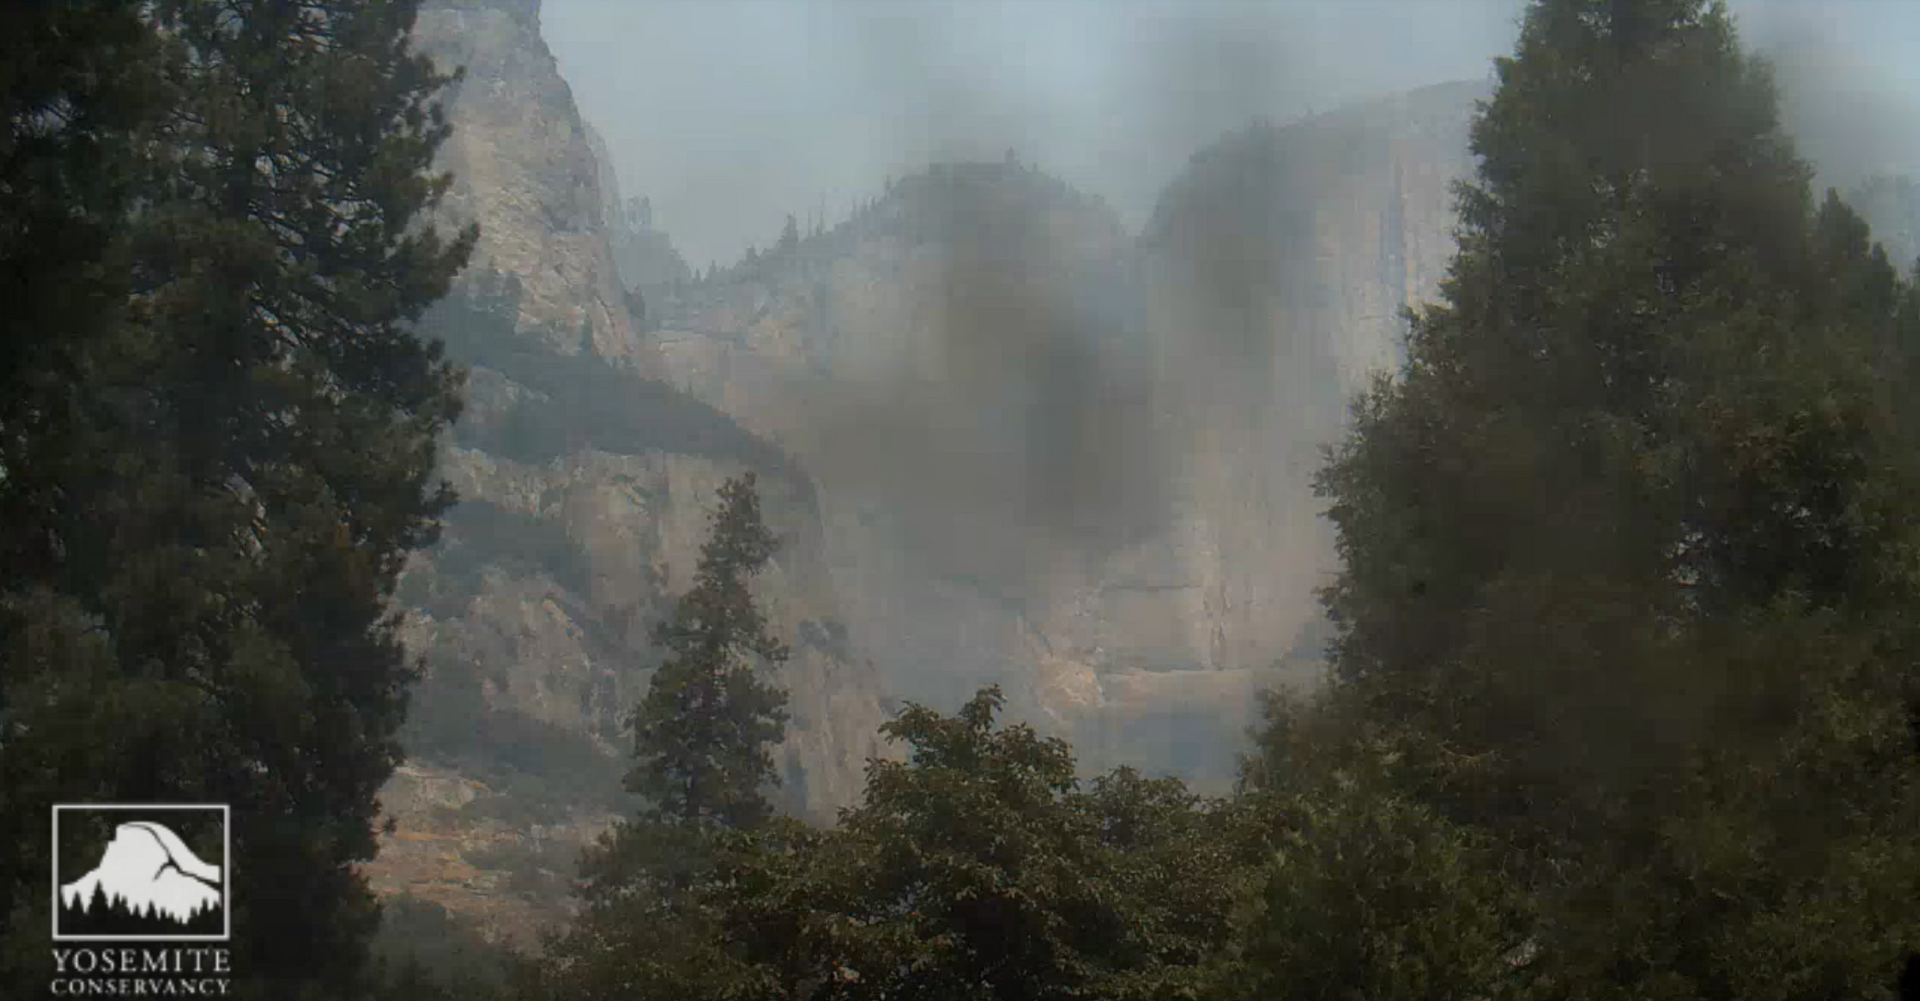 Yosemite Falls view on August 12, 2018. Courtesy of Yosemite Conservancy